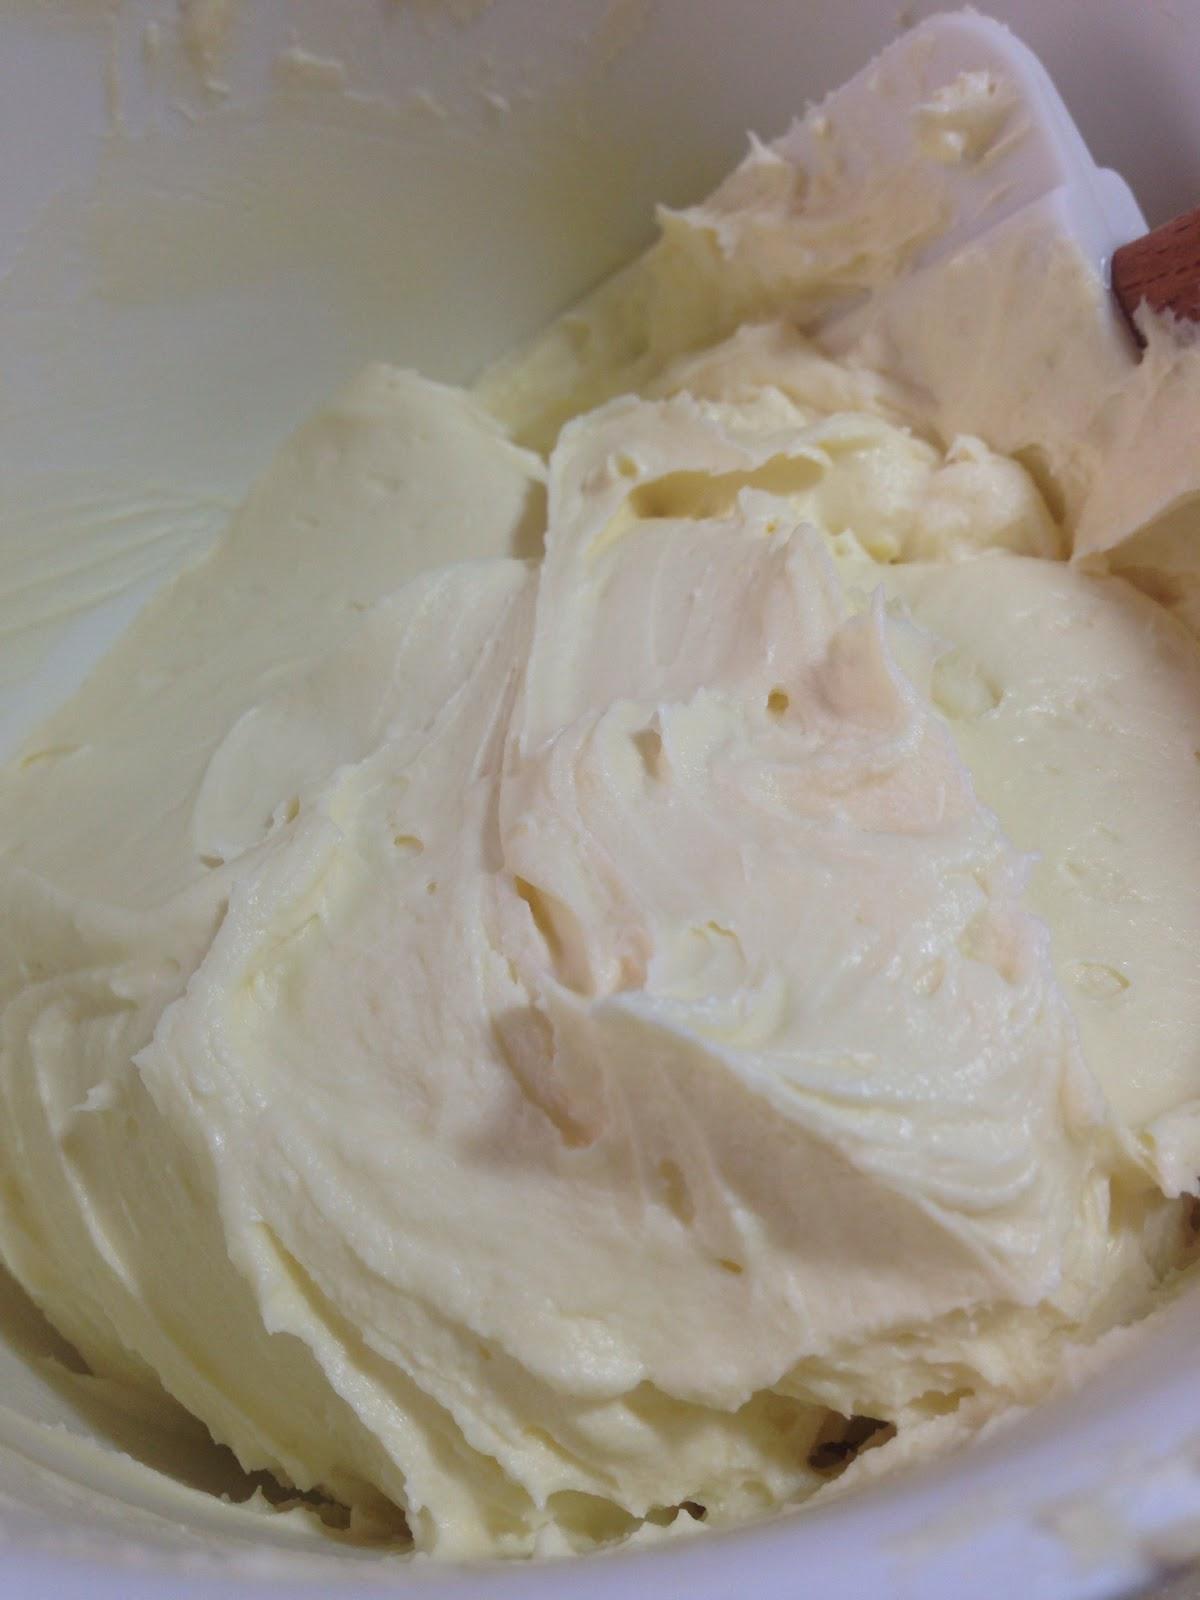 stiff cream cheese frosting